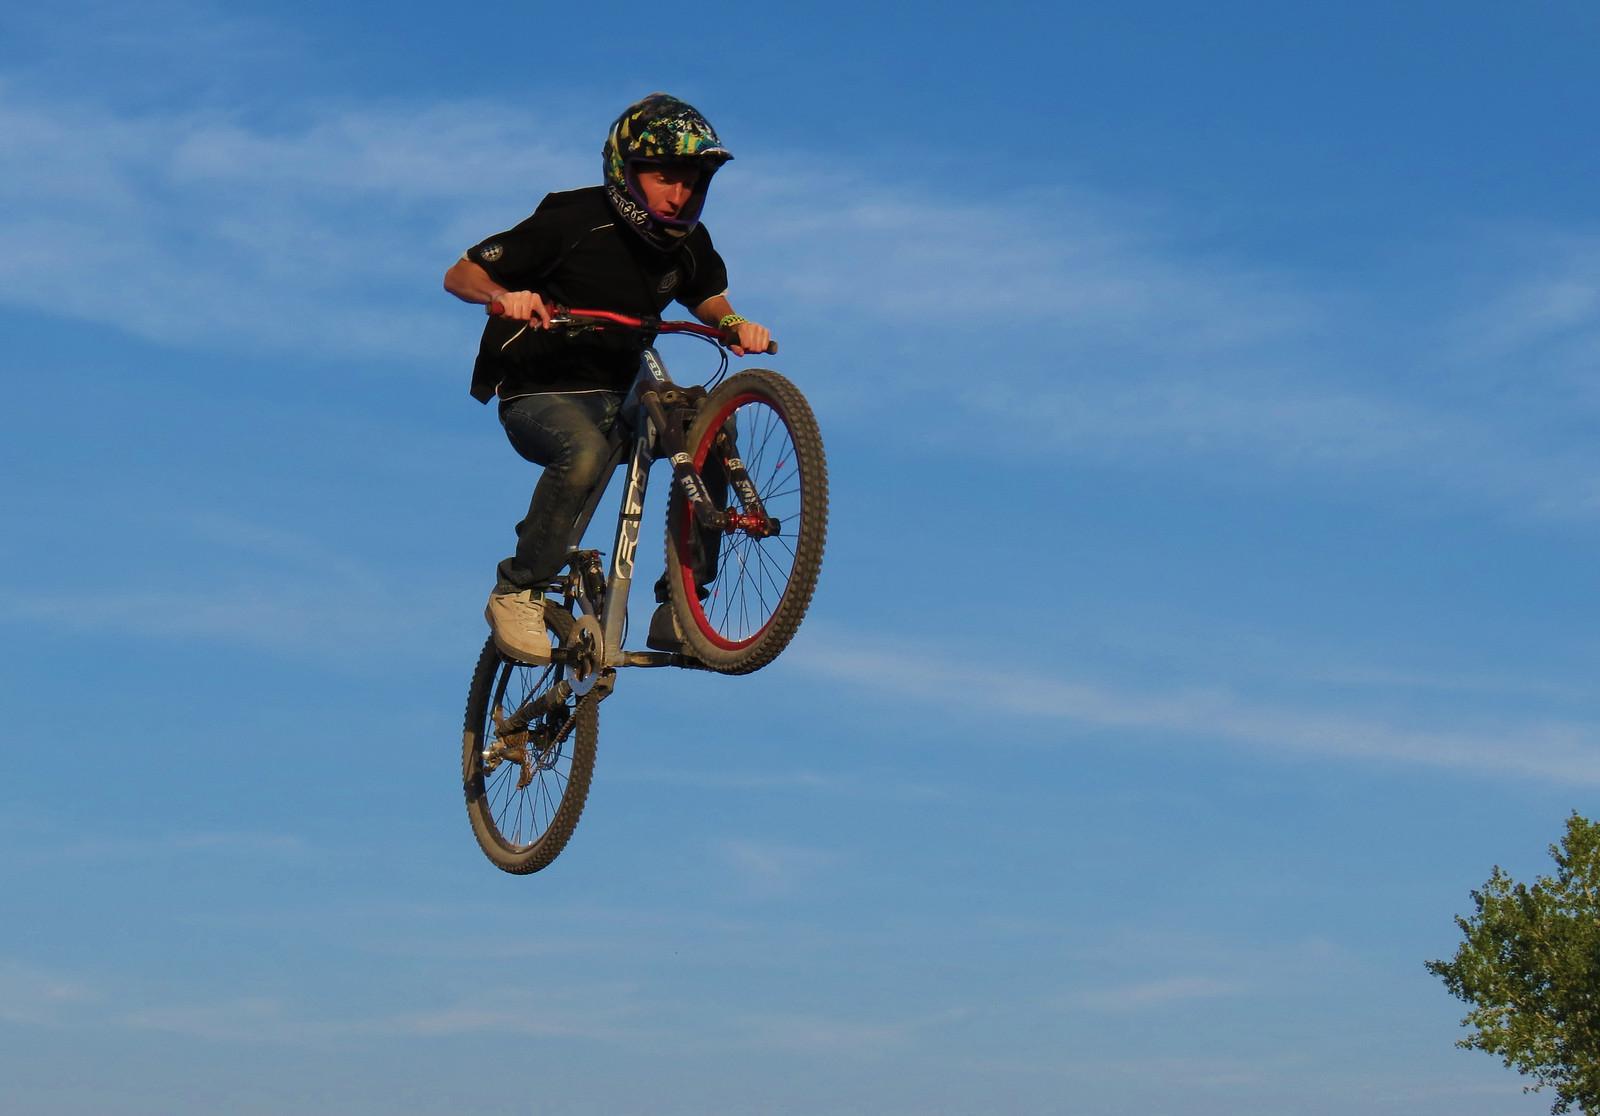 day 4 004 - Moosey - Mountain Biking Pictures - Vital MTB